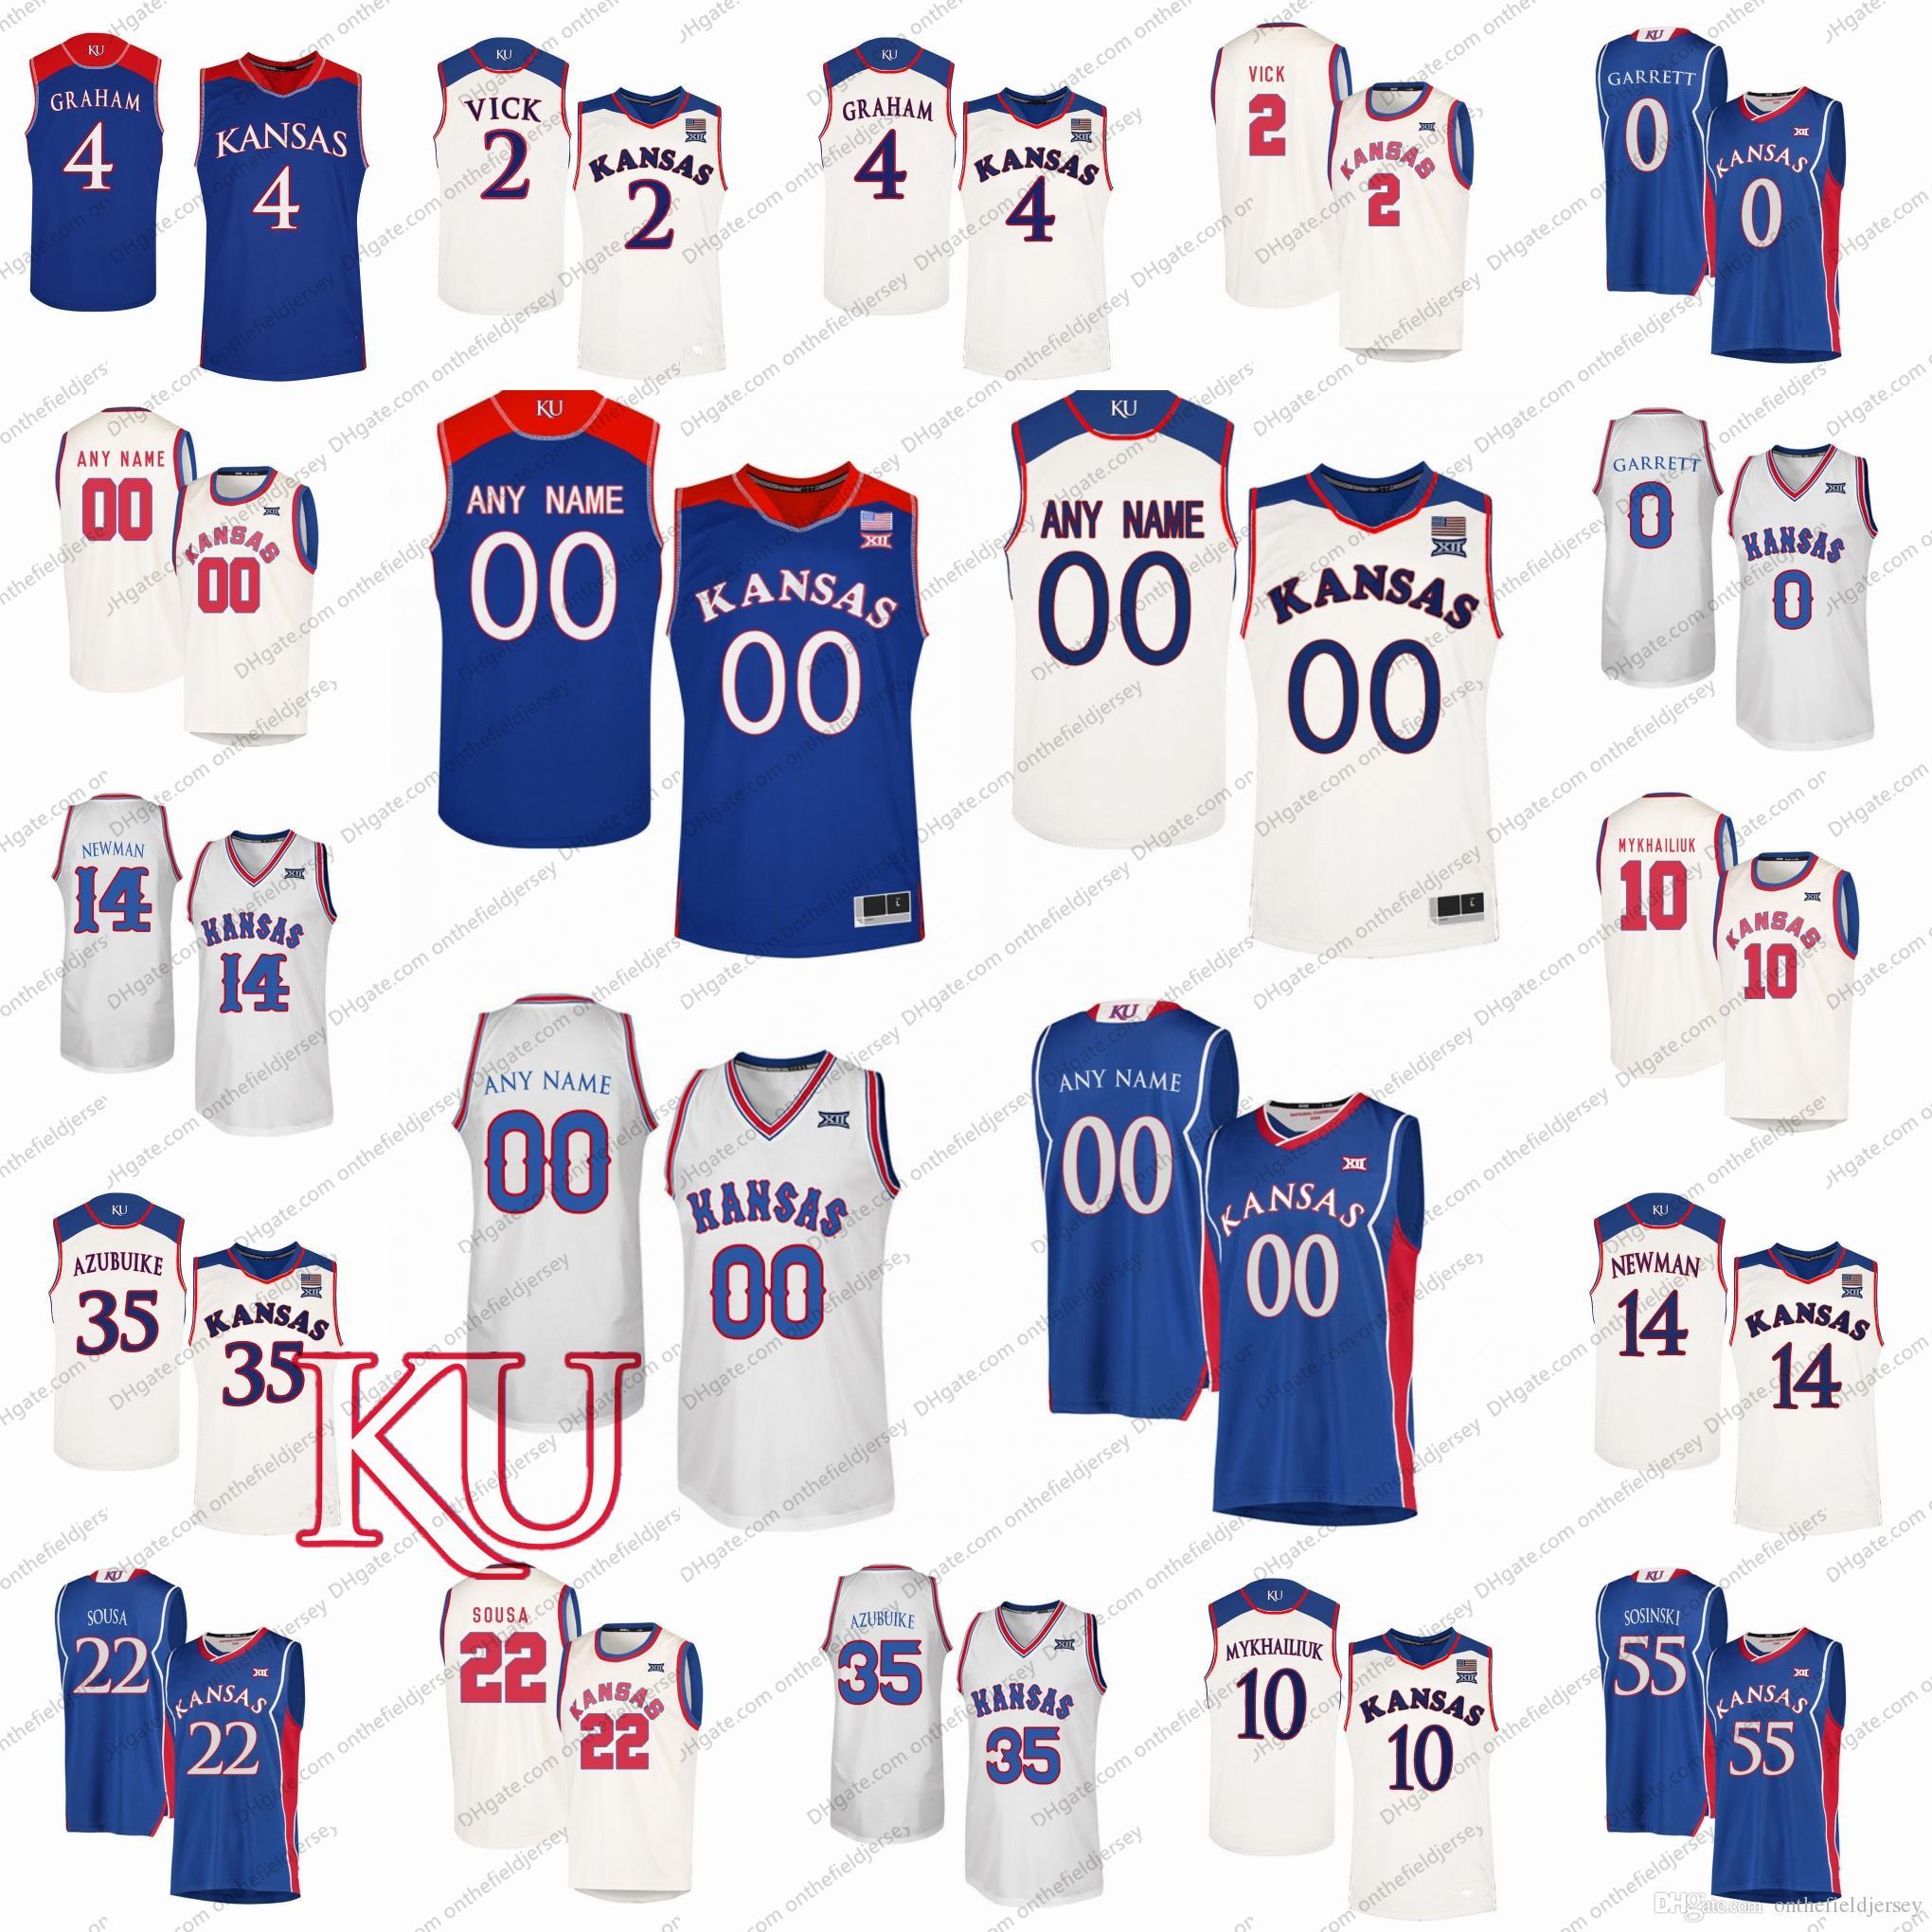 0a4351f75 2019 Custom Kansas Jayhawks NCAA Basketball Jerseys Any Name Number  0  Marcus Garrett 2 Vick 4 Devonte Graham 10 Sviatoslav Mykhailiuk S 3XL From  ...